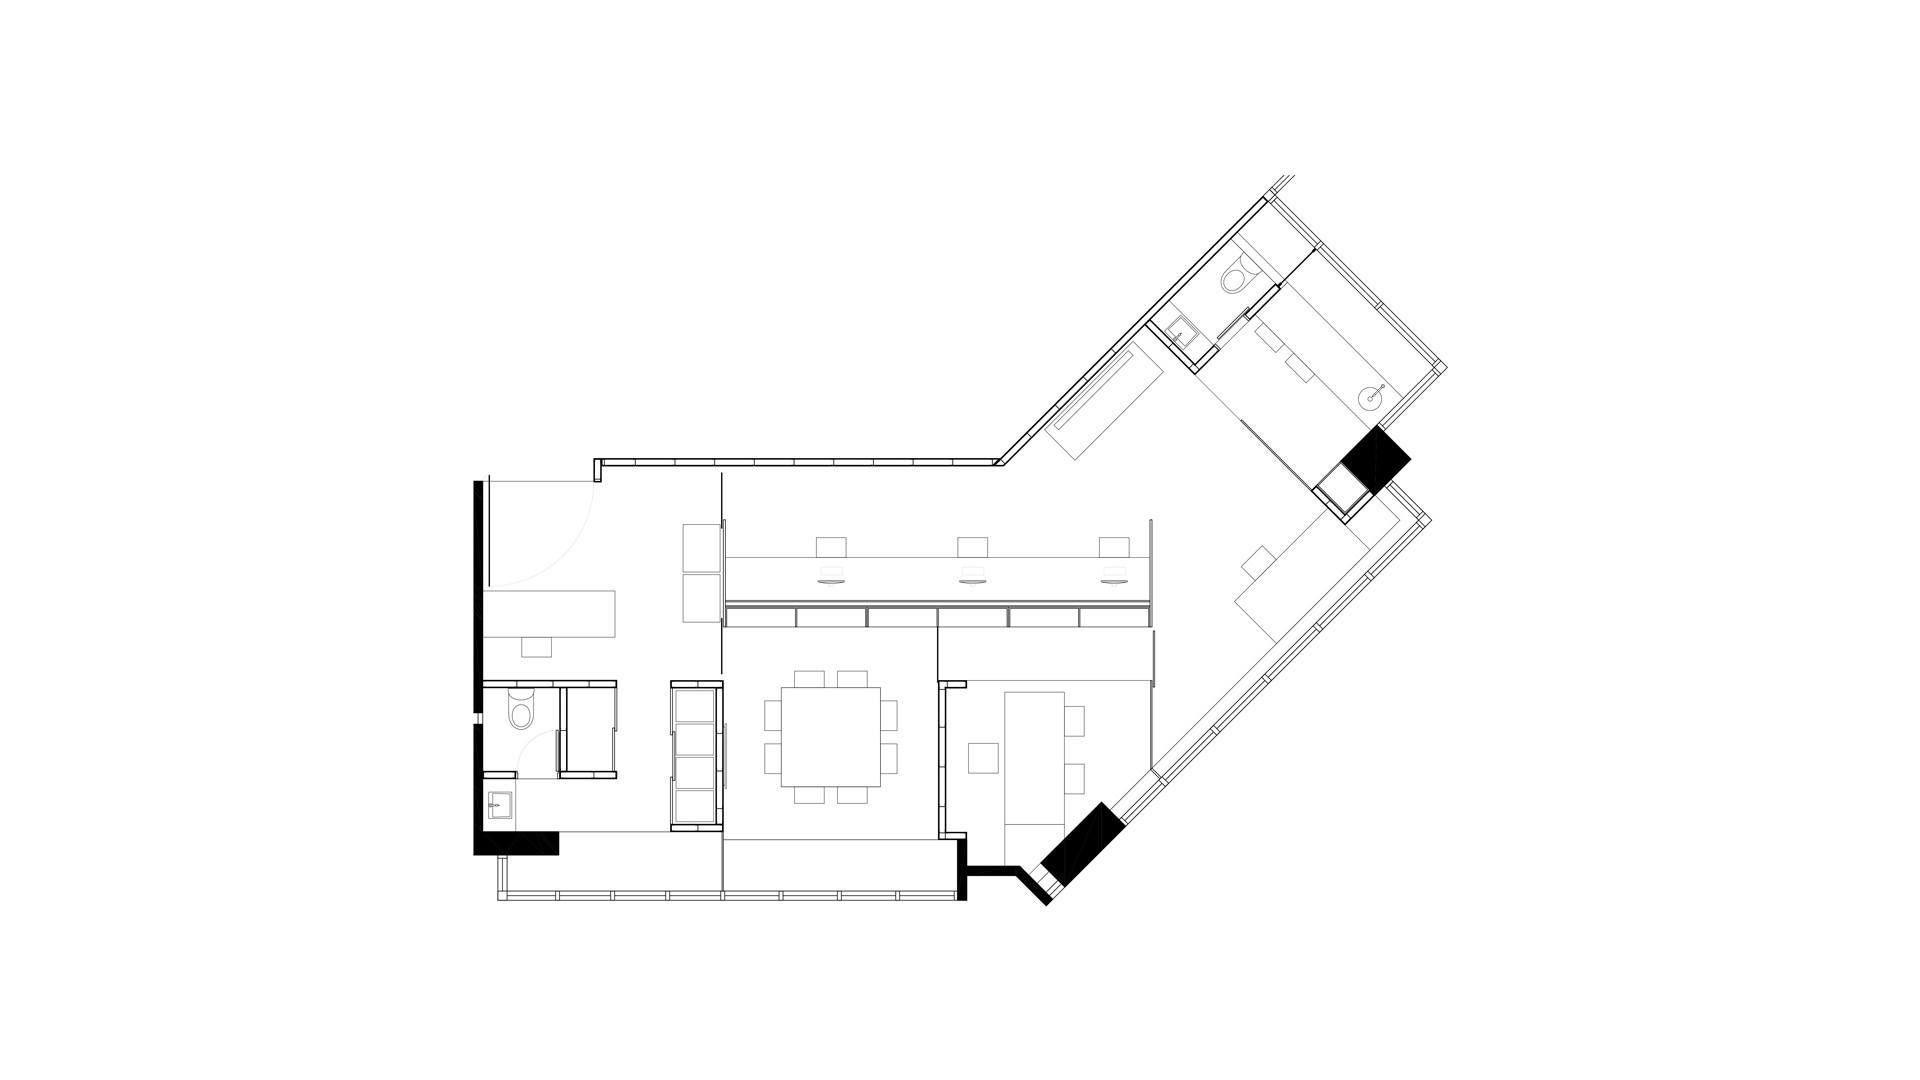 sede-administrativa-trigao-planta